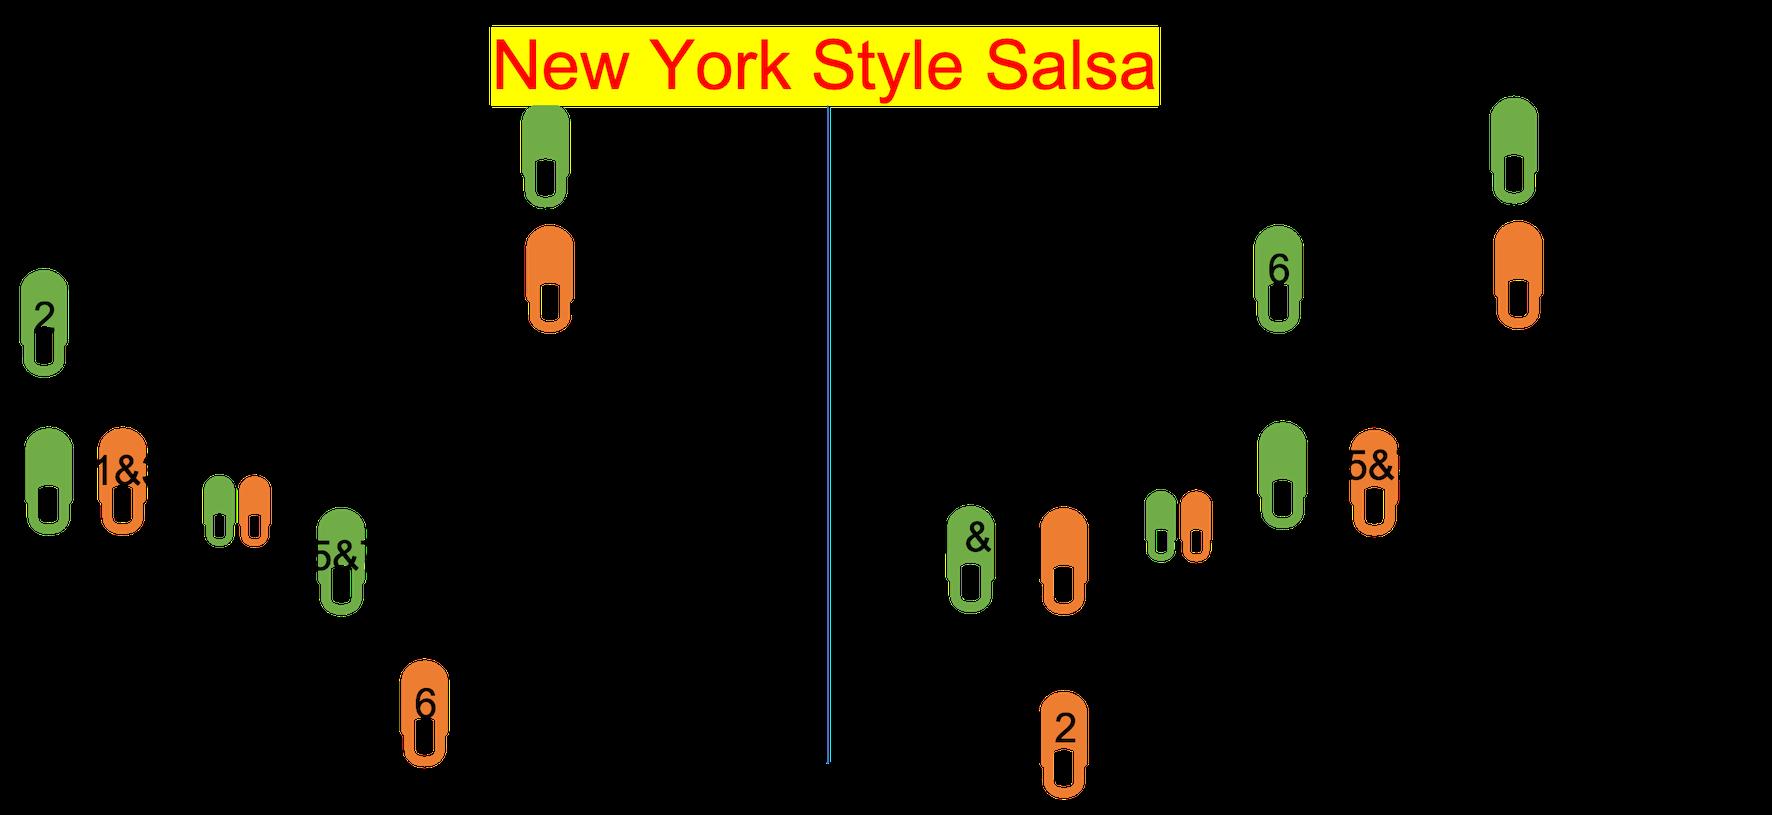 Basic steps of New York style salsa. For men and women.